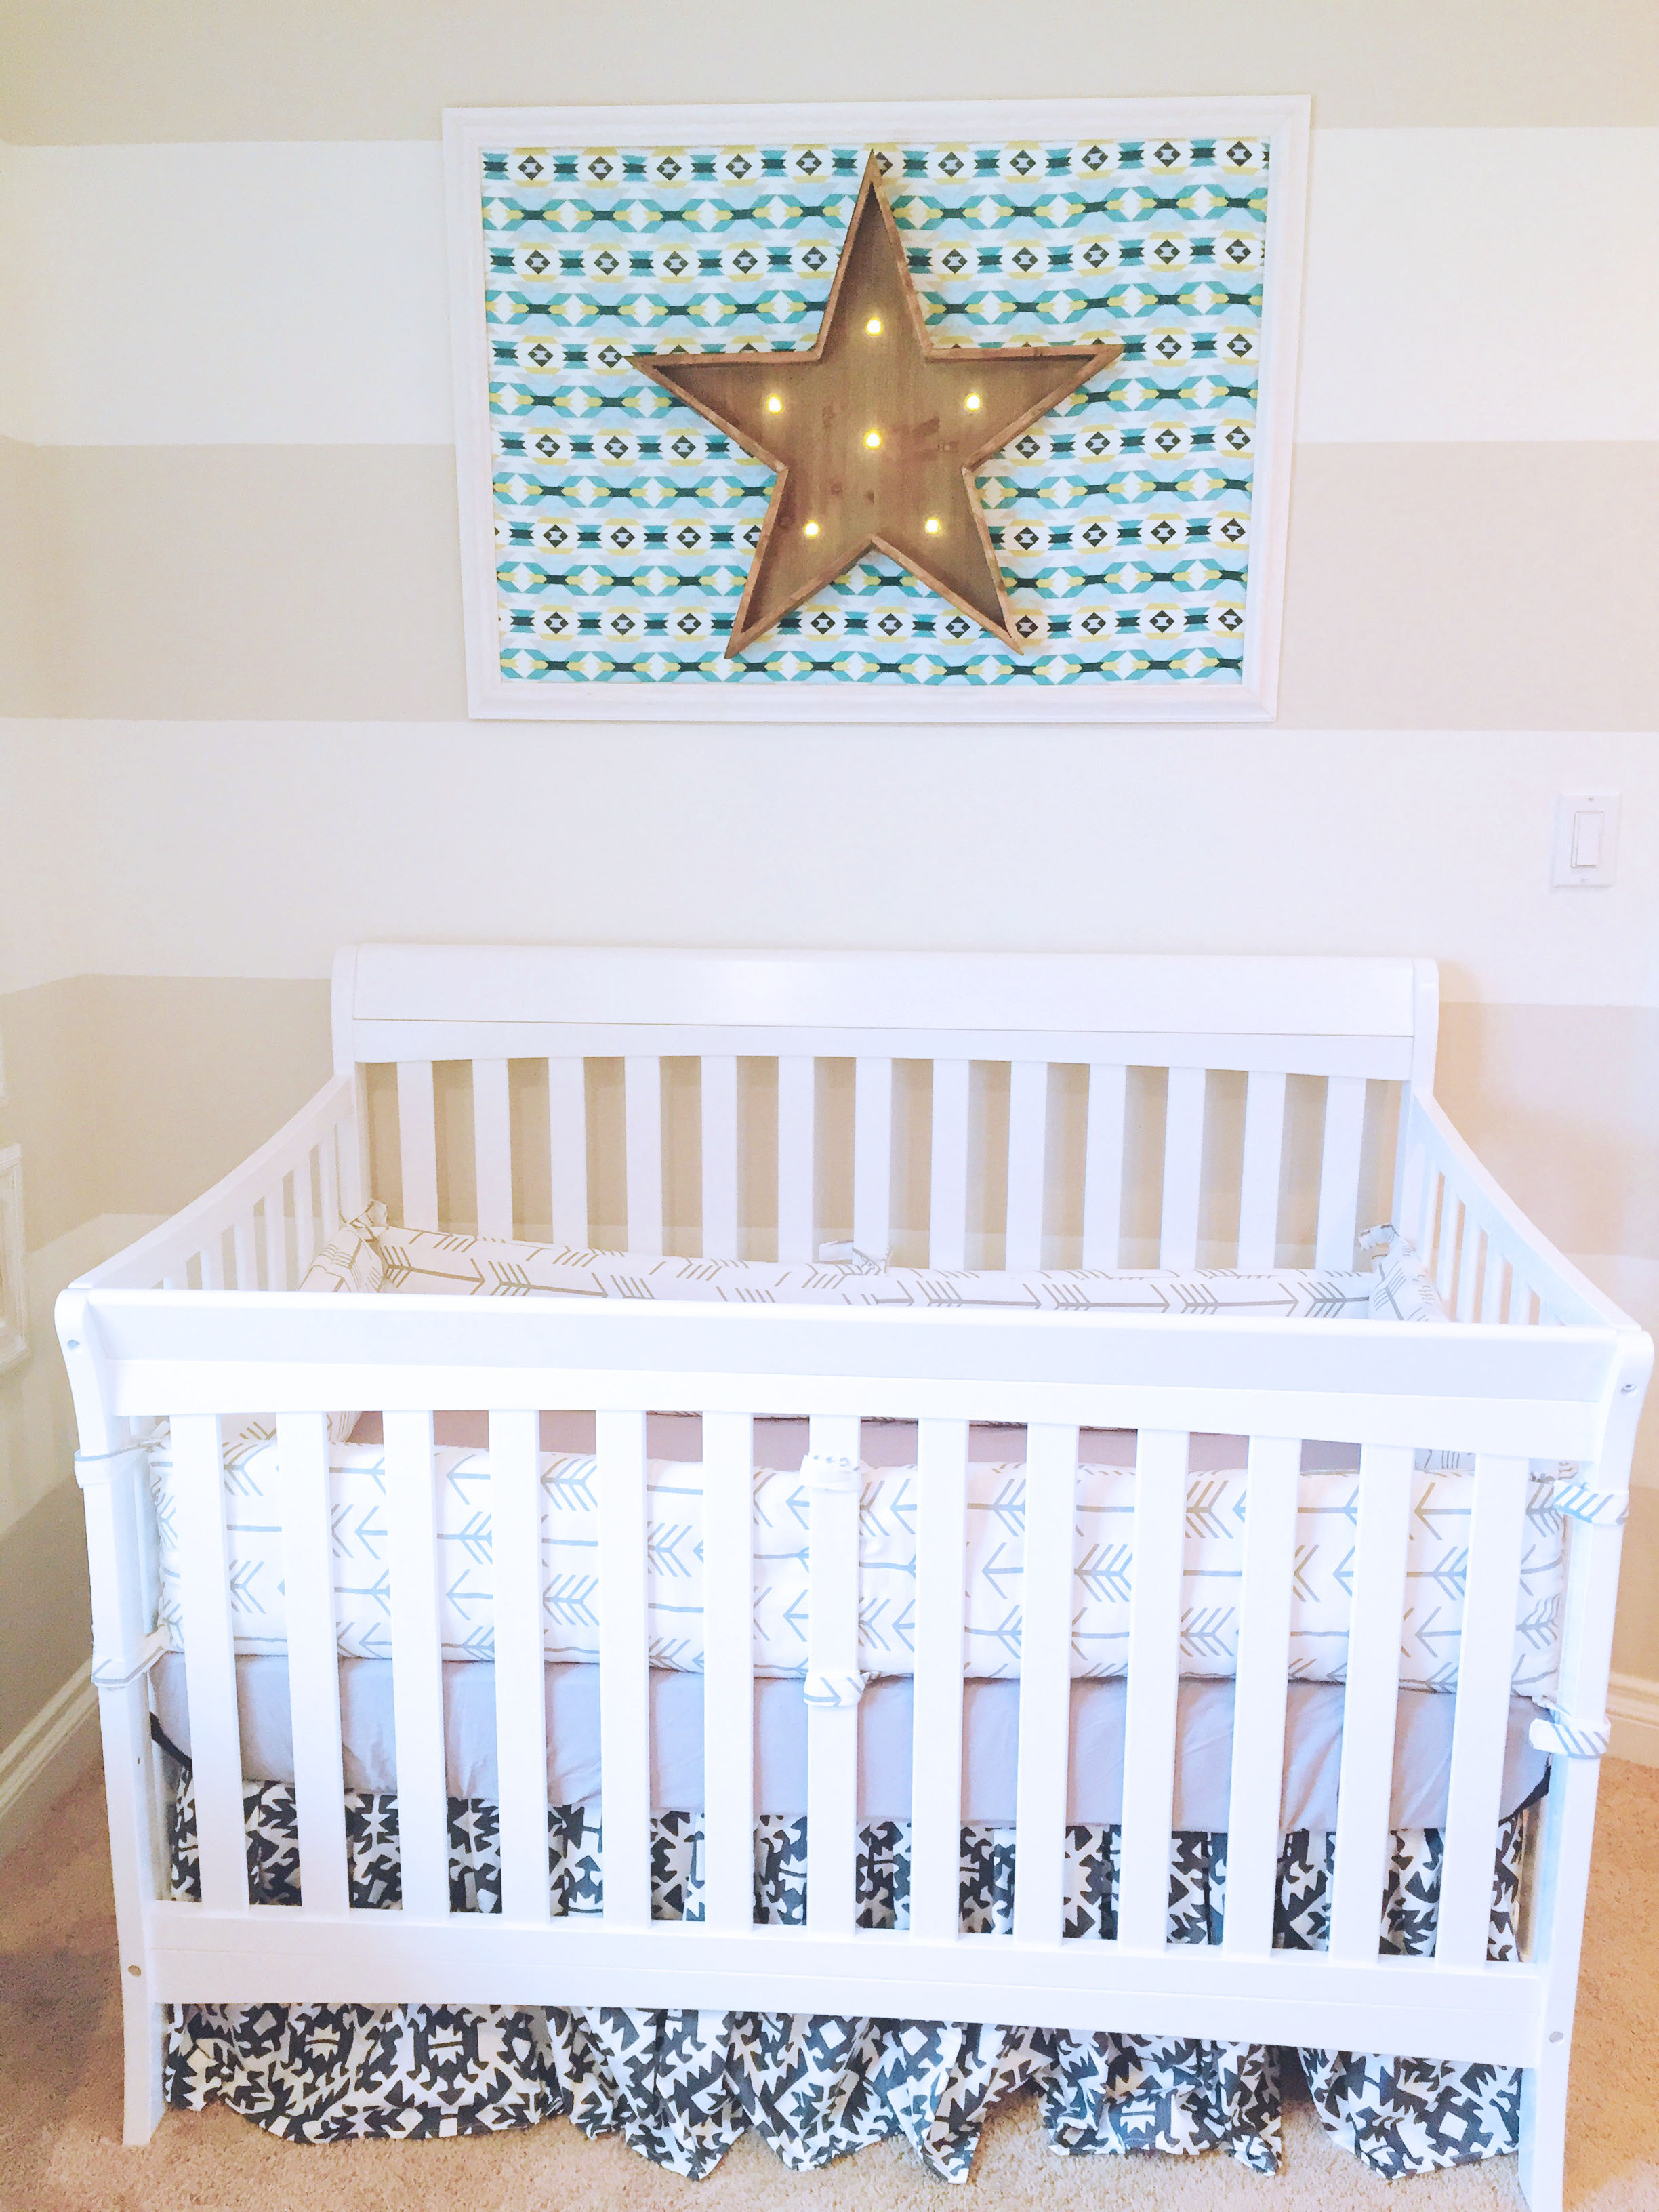 How to Make a Custom Photo Mat - Baby Nursery 101 - Miss Bizi Bee